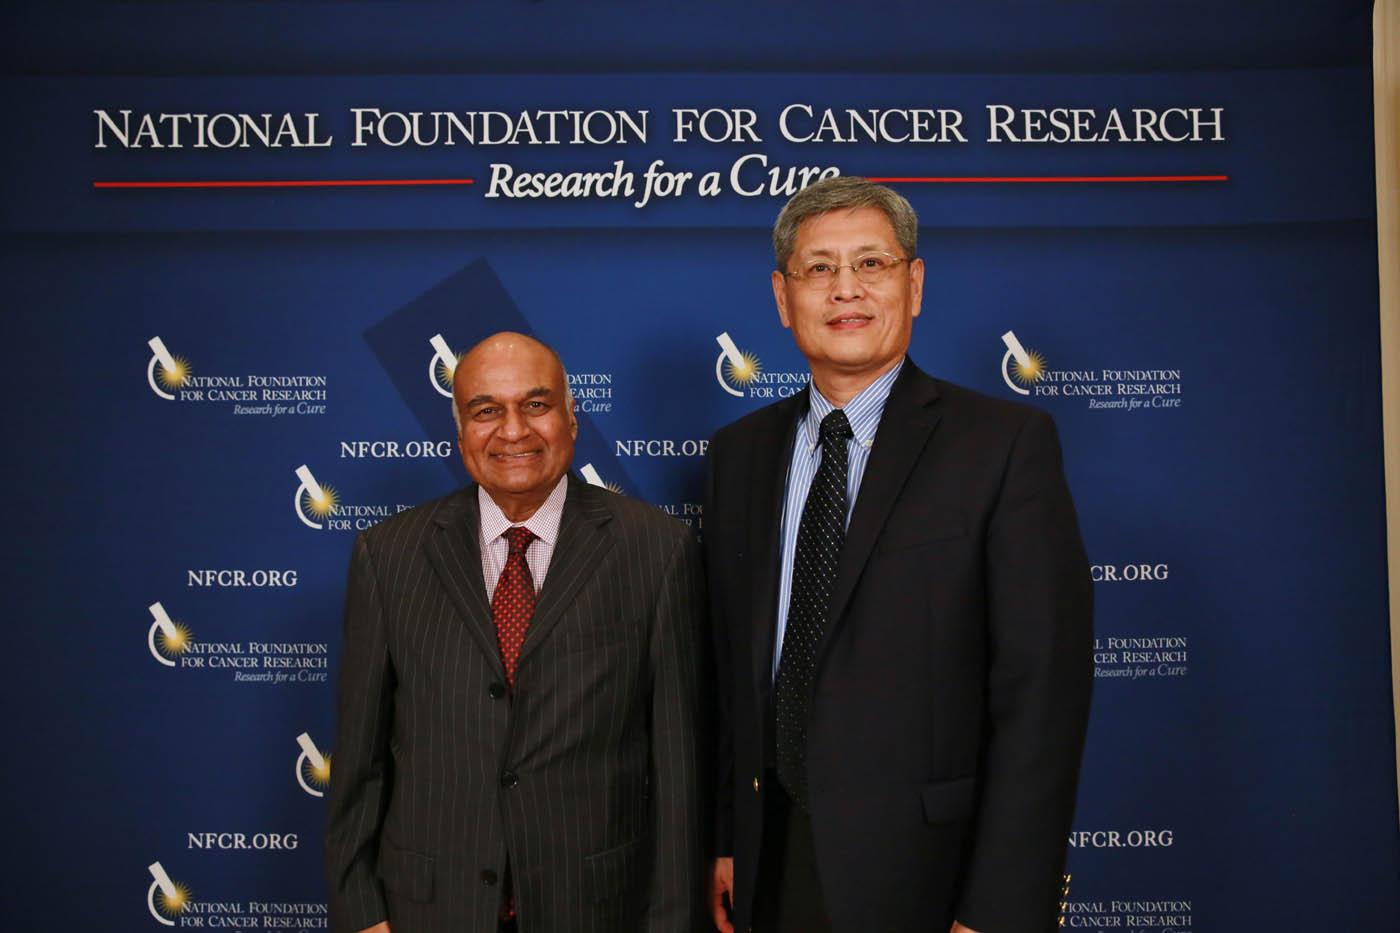 NFCR's Dr. Michael Wang & Harvard's Dr. Raju Kucherlapati